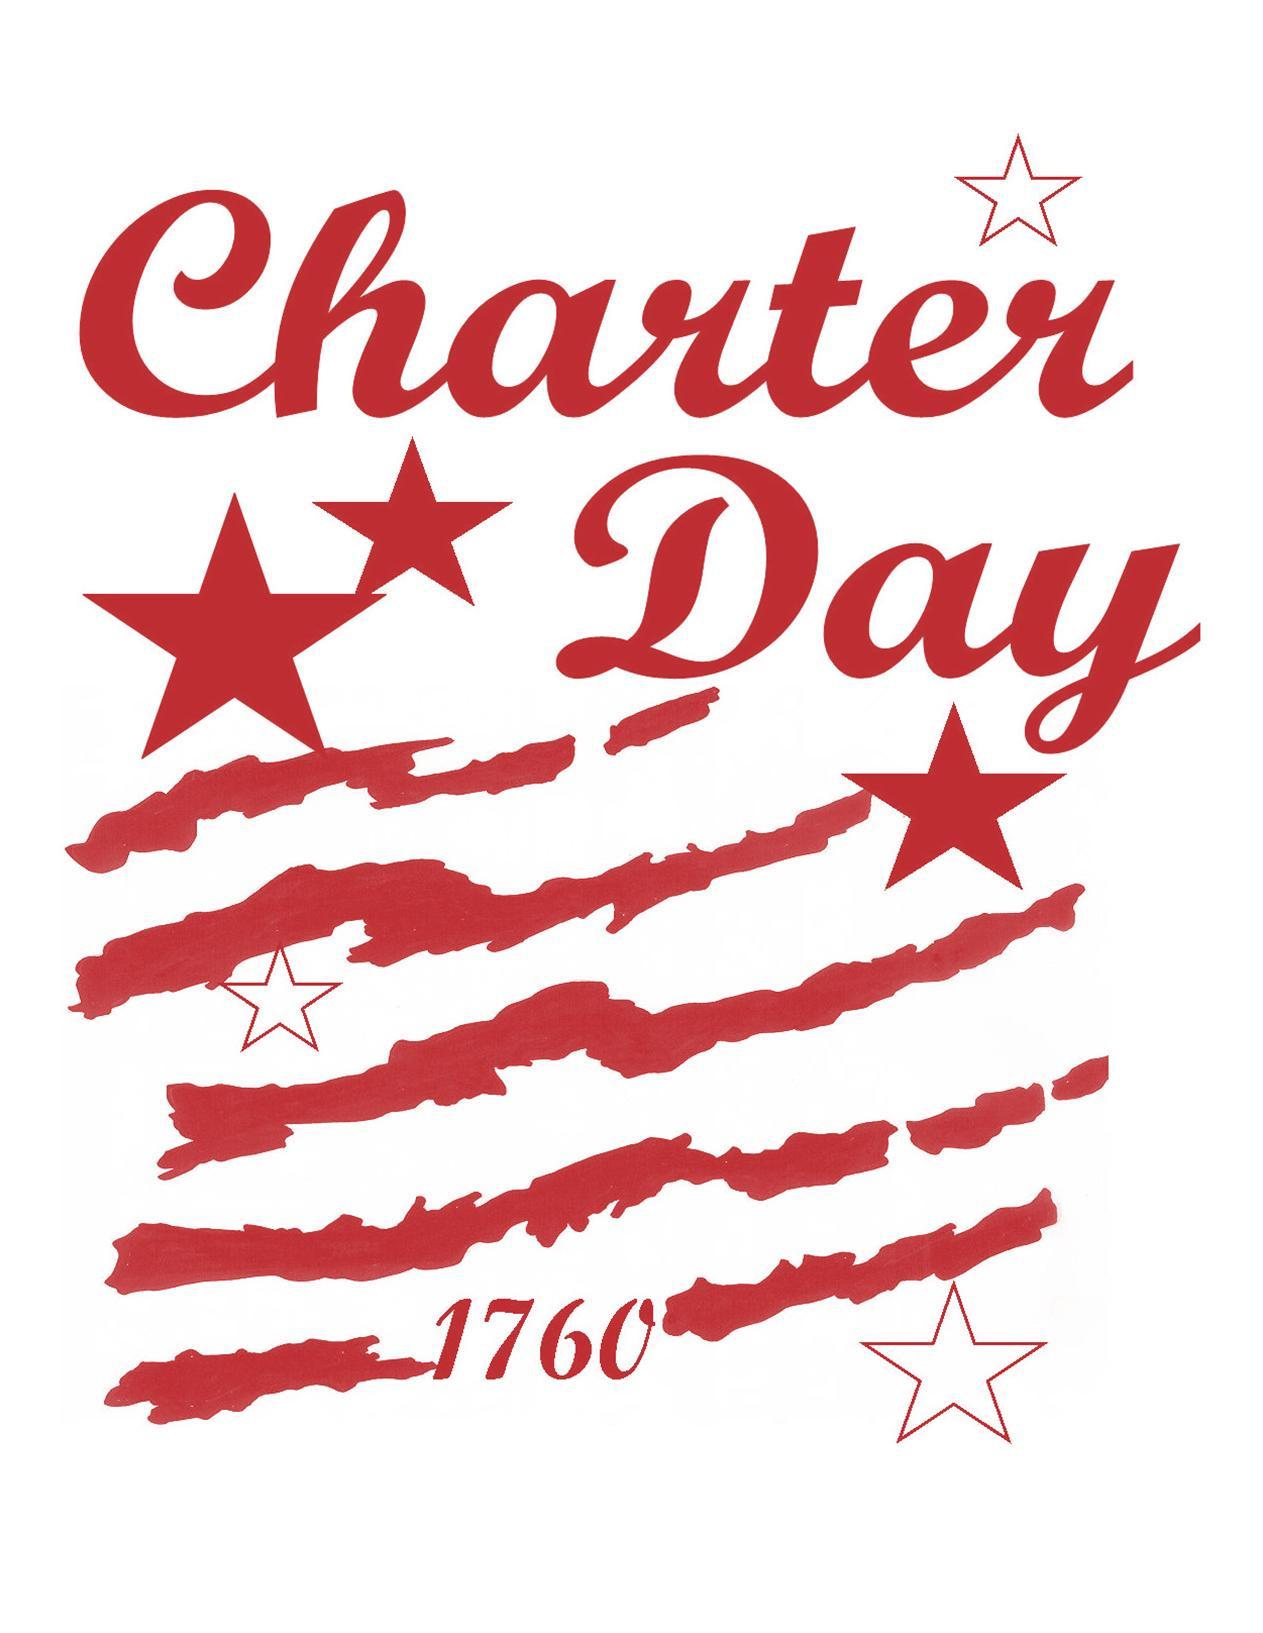 Charter Day logo